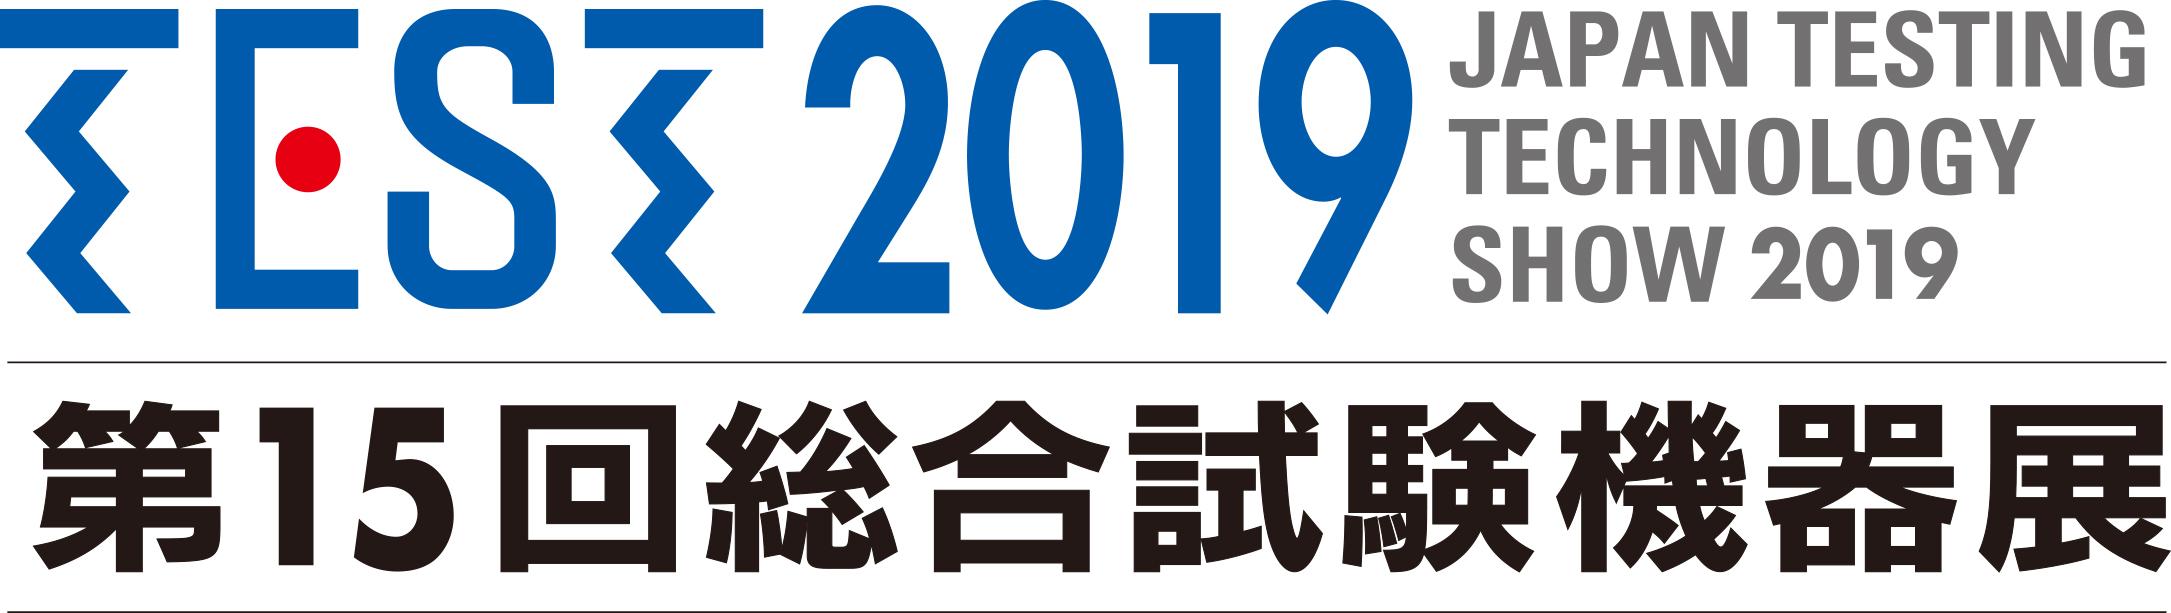 test2019_logo